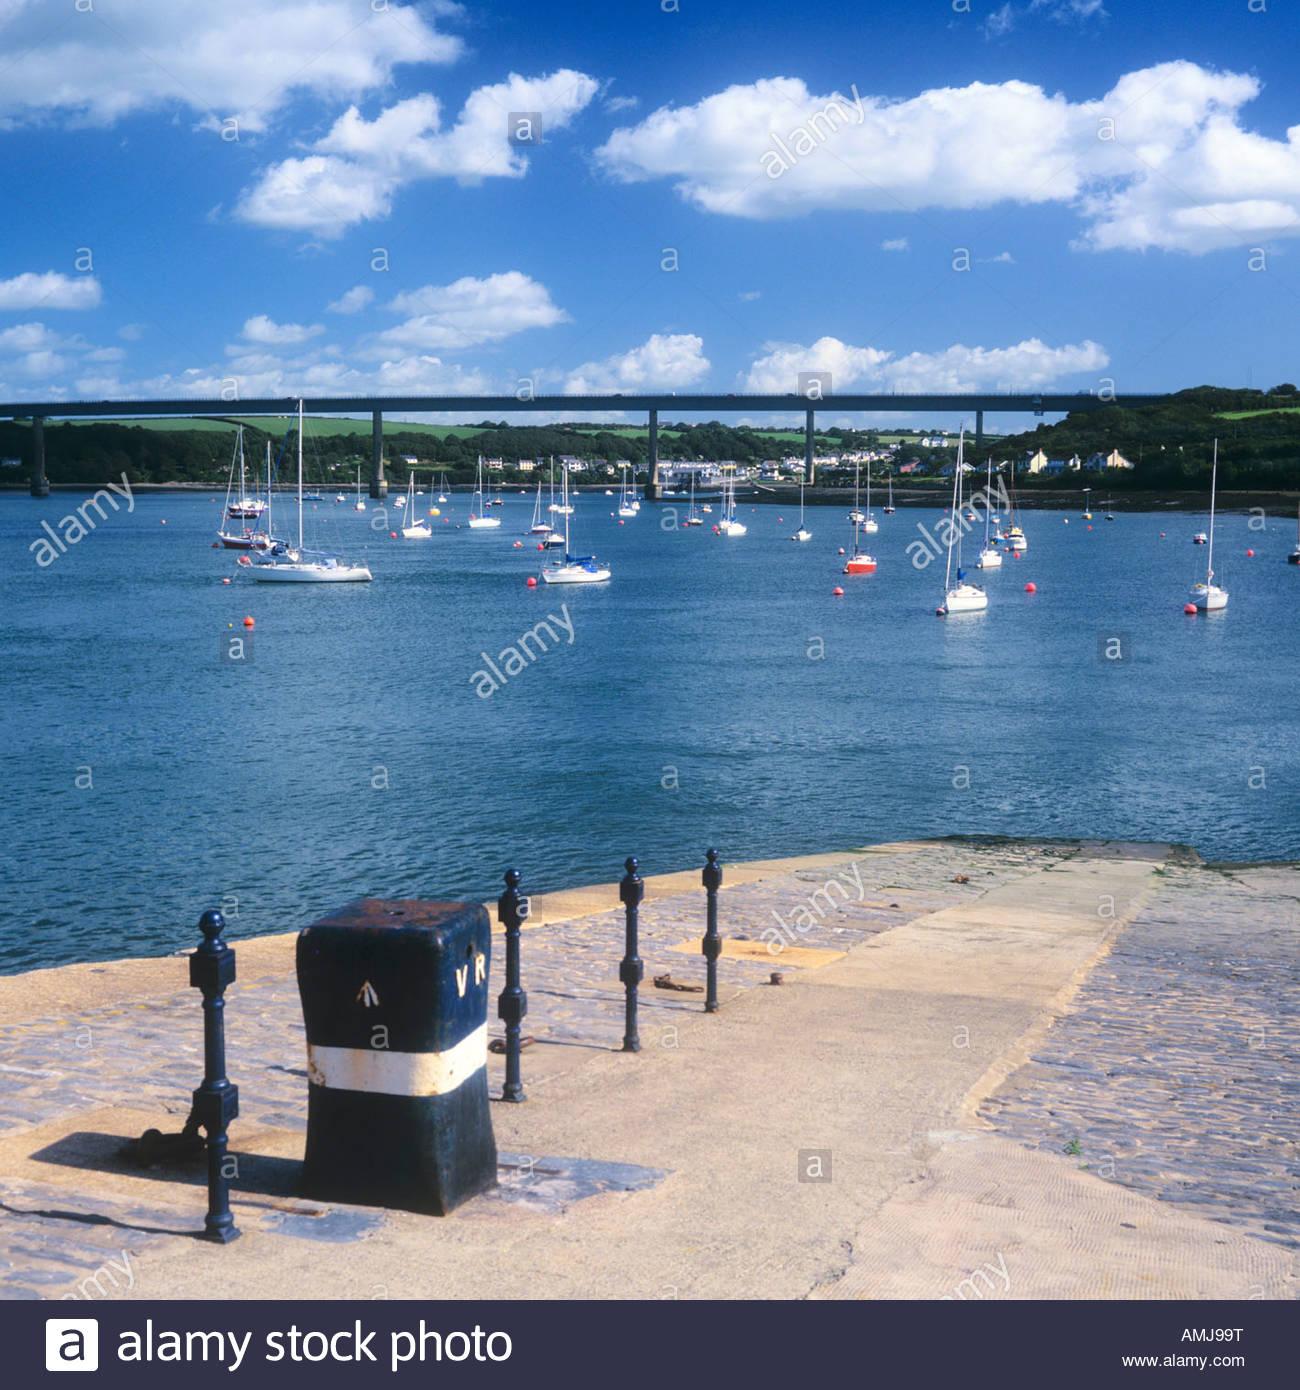 Hobb's Point on Daugleddau River at Pembroke Dock Wales UK - Stock Image